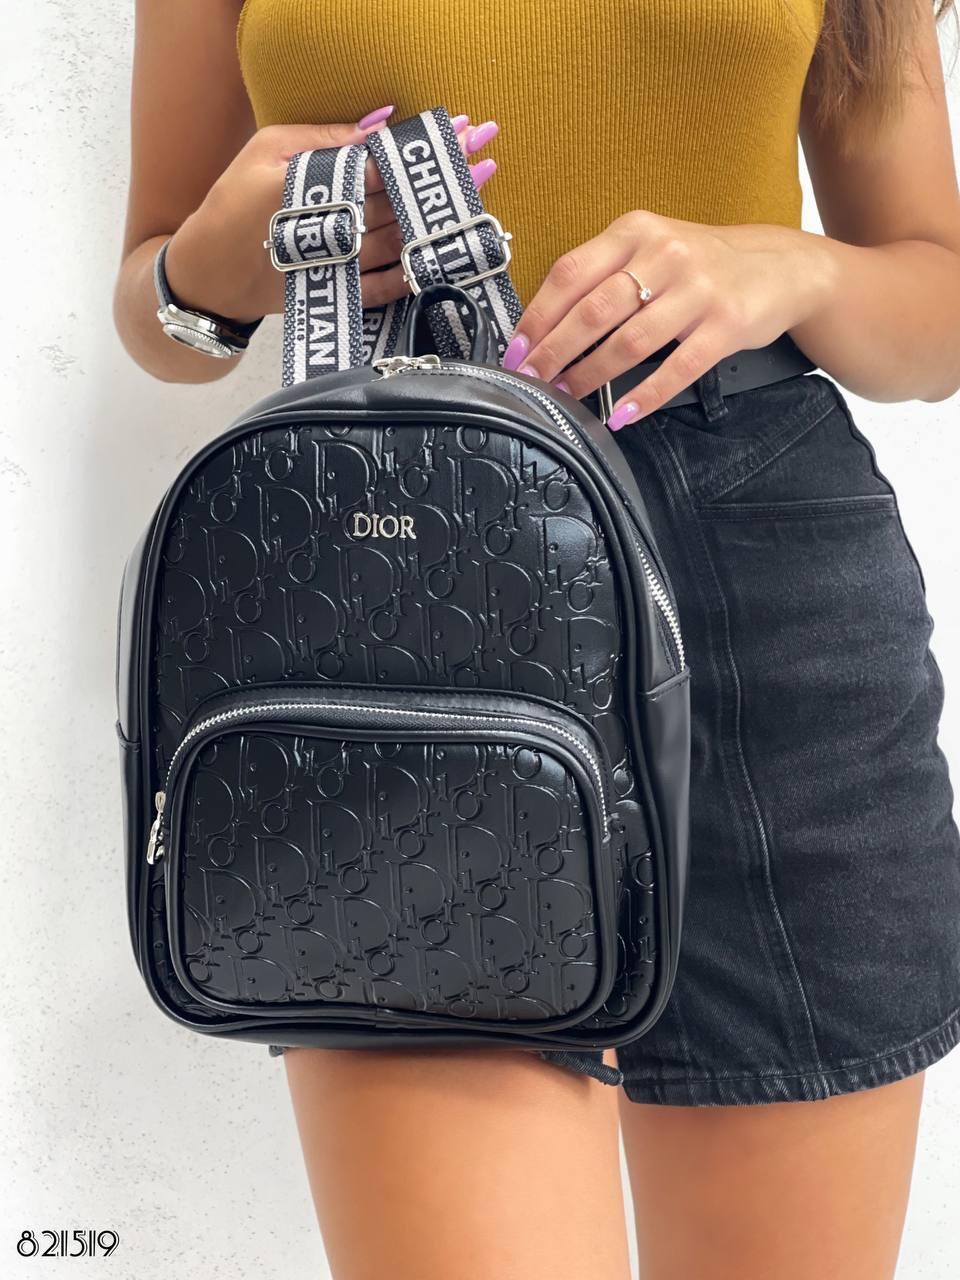 Рюкзак в стиле Диор  медиум размер